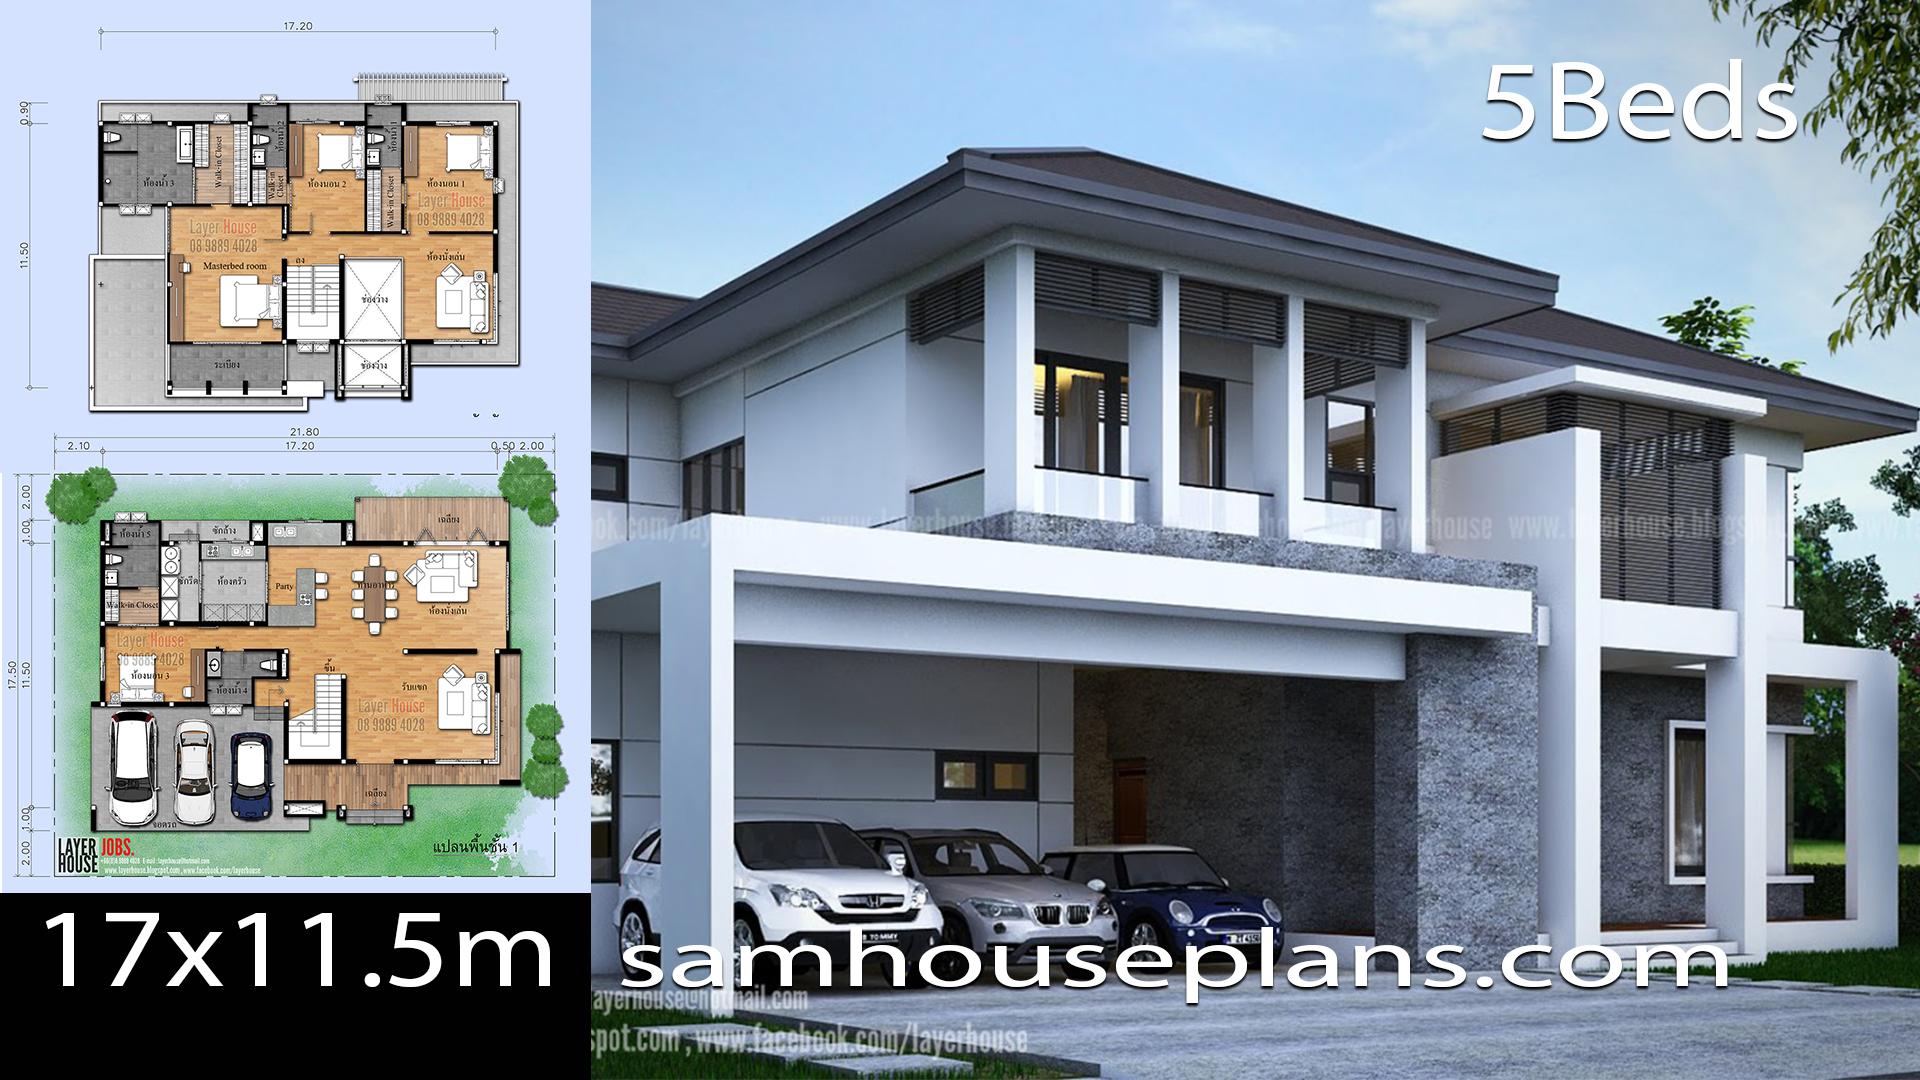 House Plans Idea 17x11 5m With 5 Bedrooms Samhouseplans